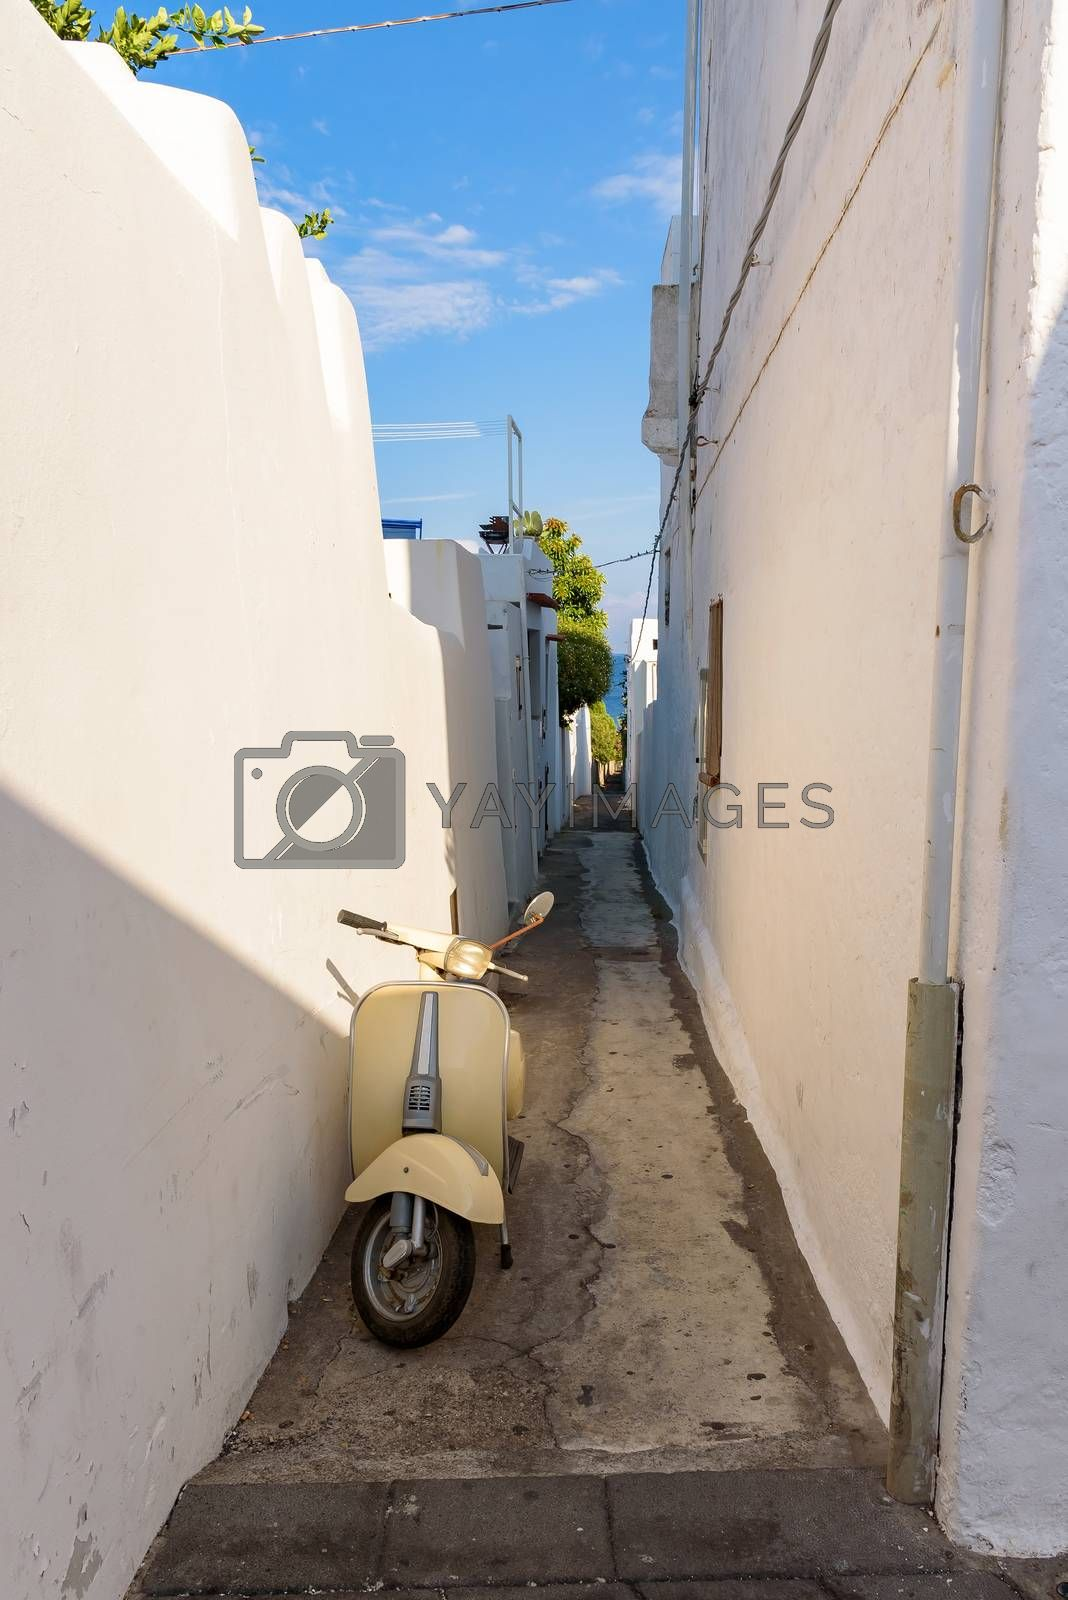 Scooter in narrow street of Stromboli village, Aeolian Islands, Italy